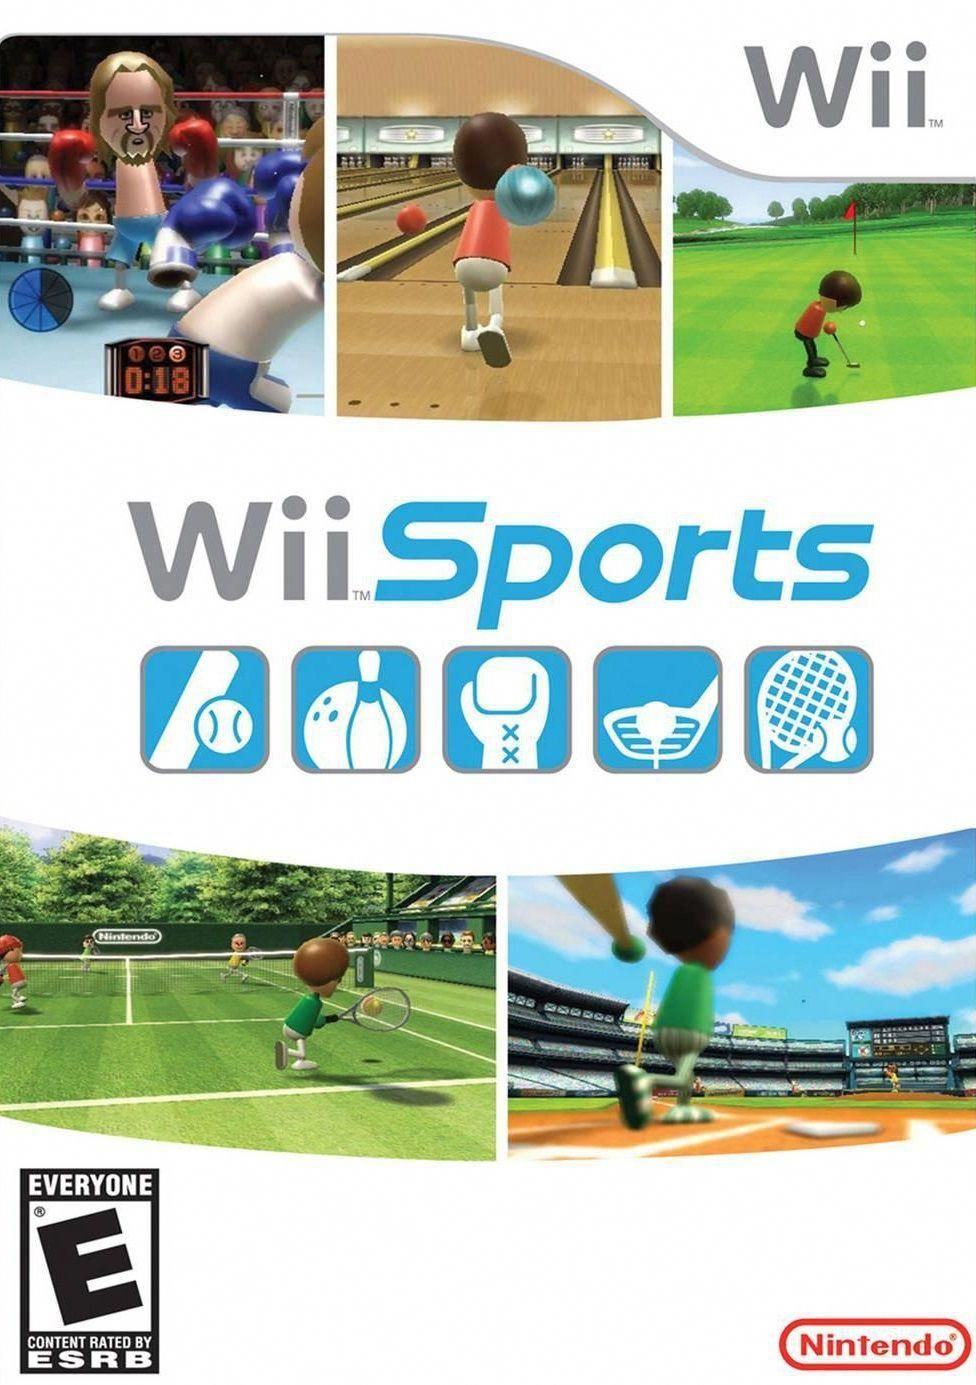 Key 2688064919 Wii games, Wii sports, Wii